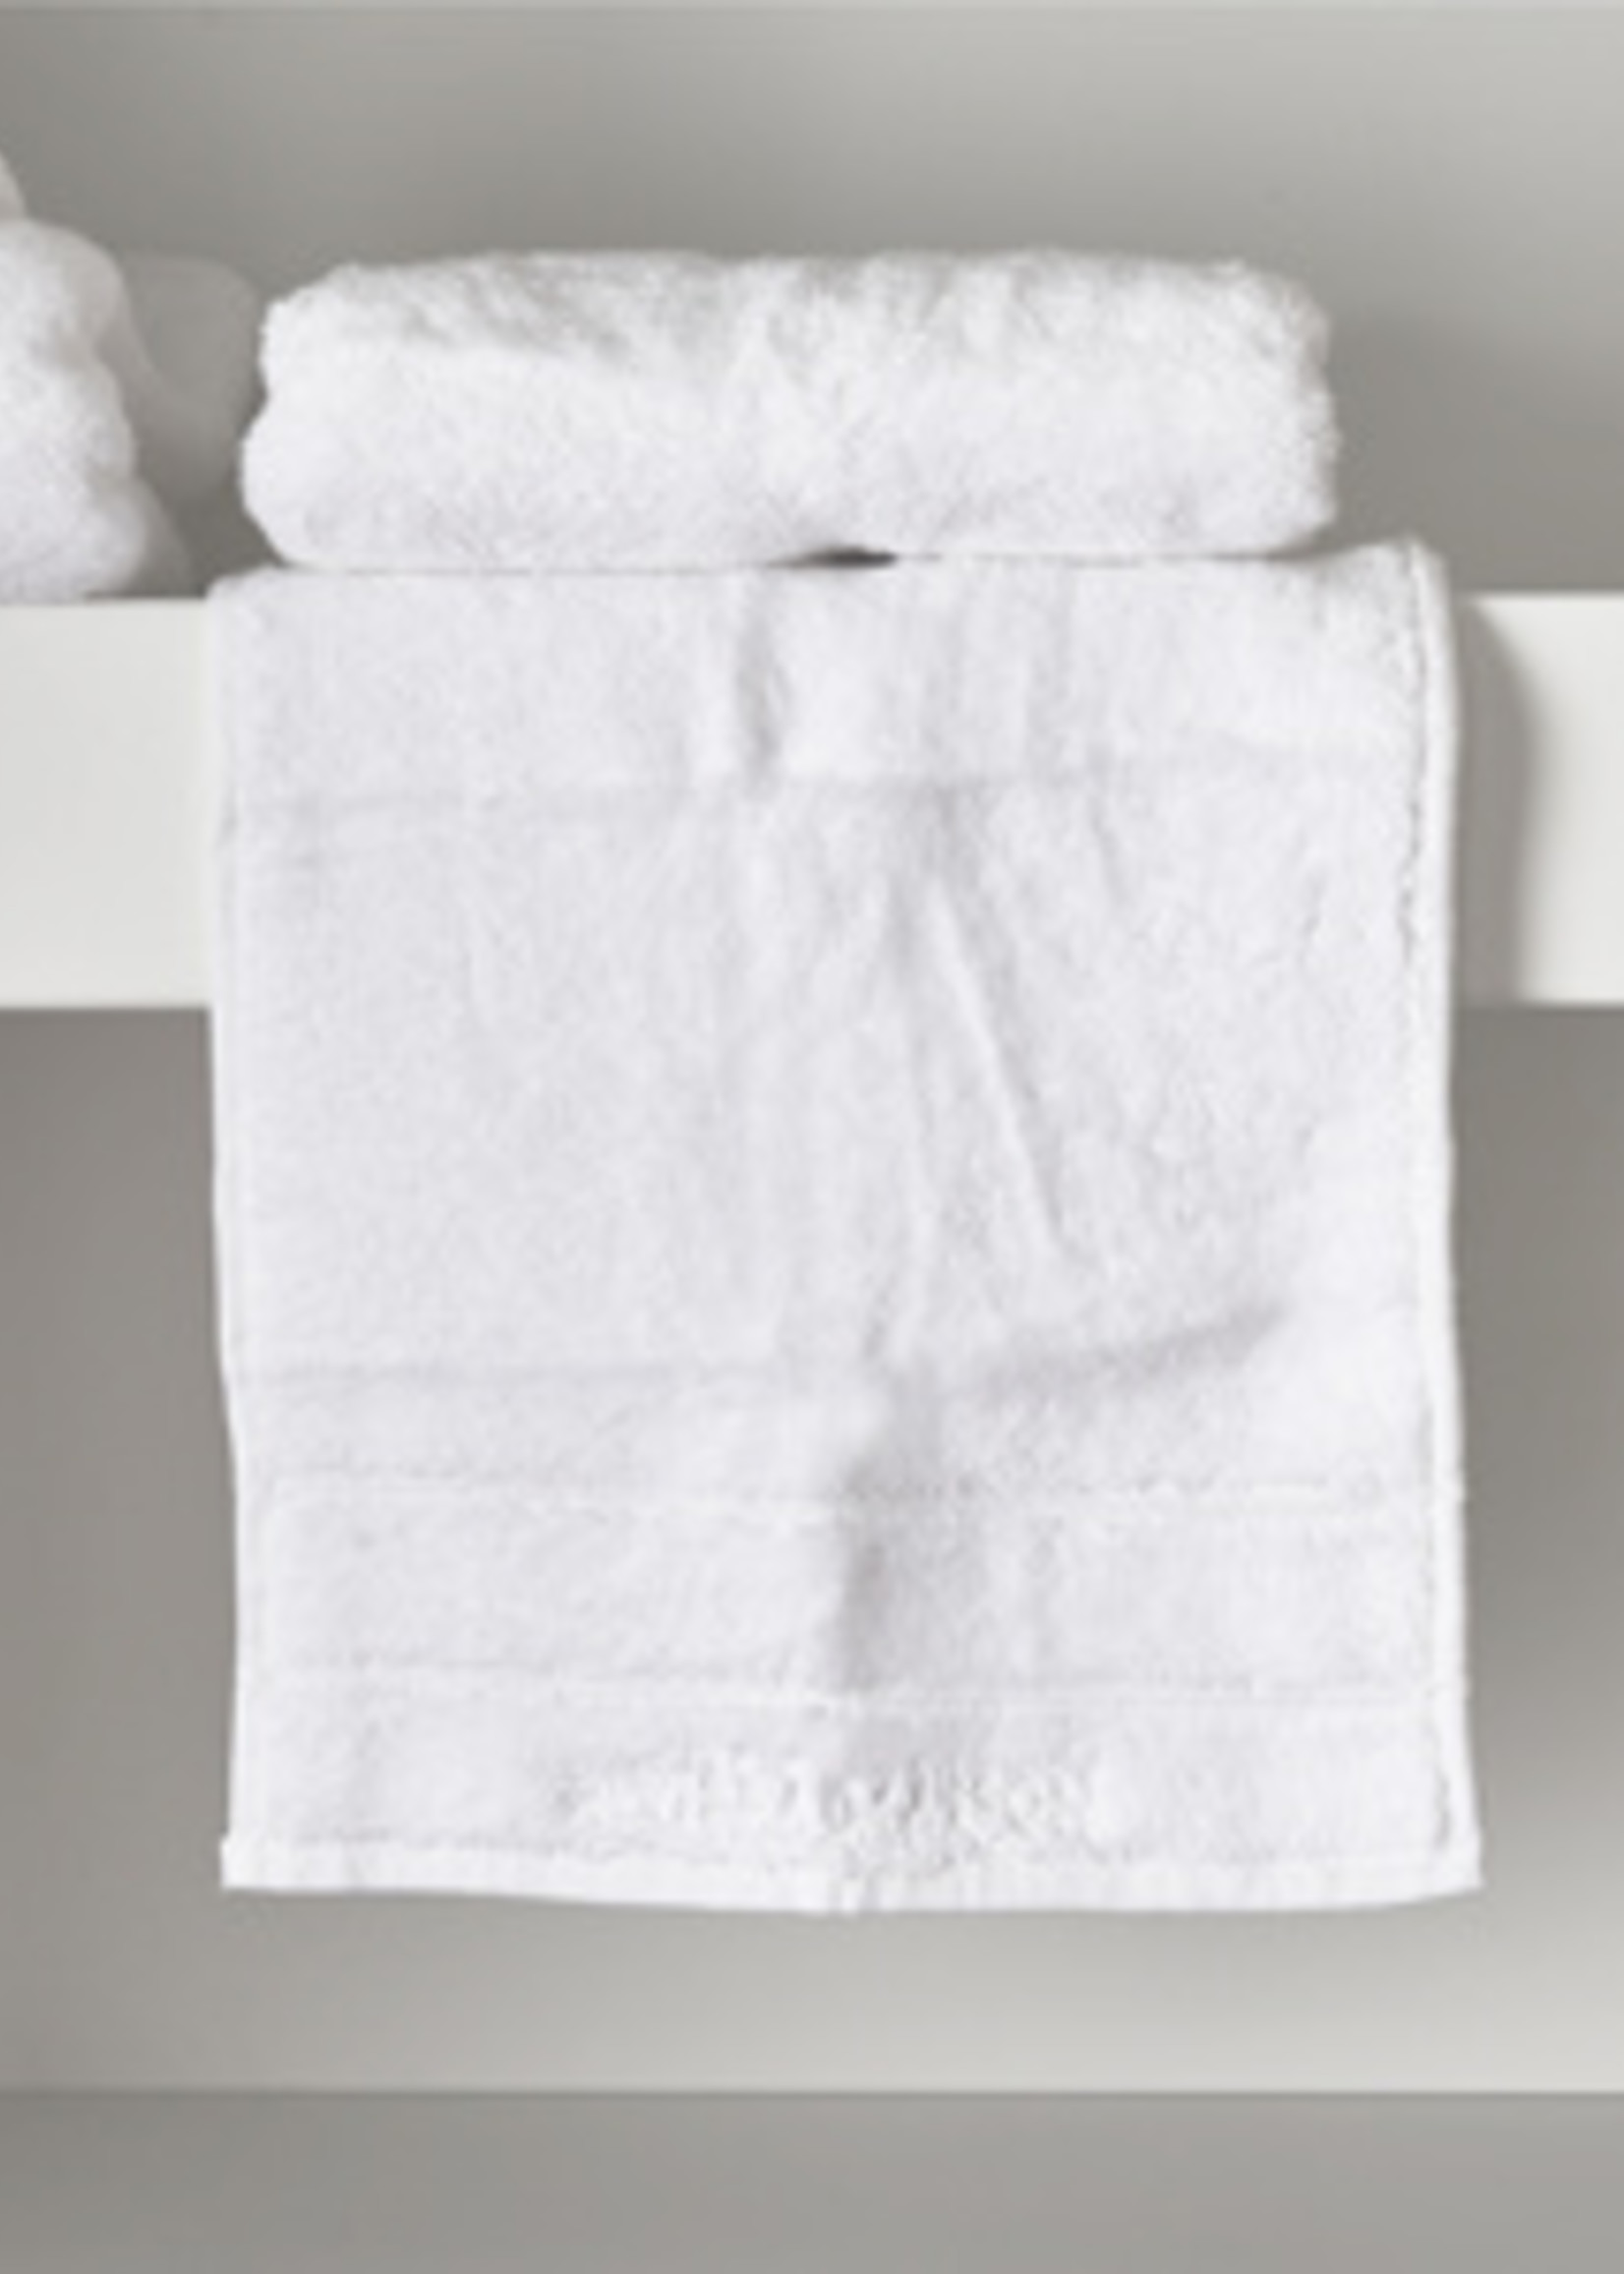 Riviera Maison RM Hotel Guest Towel white 50x30